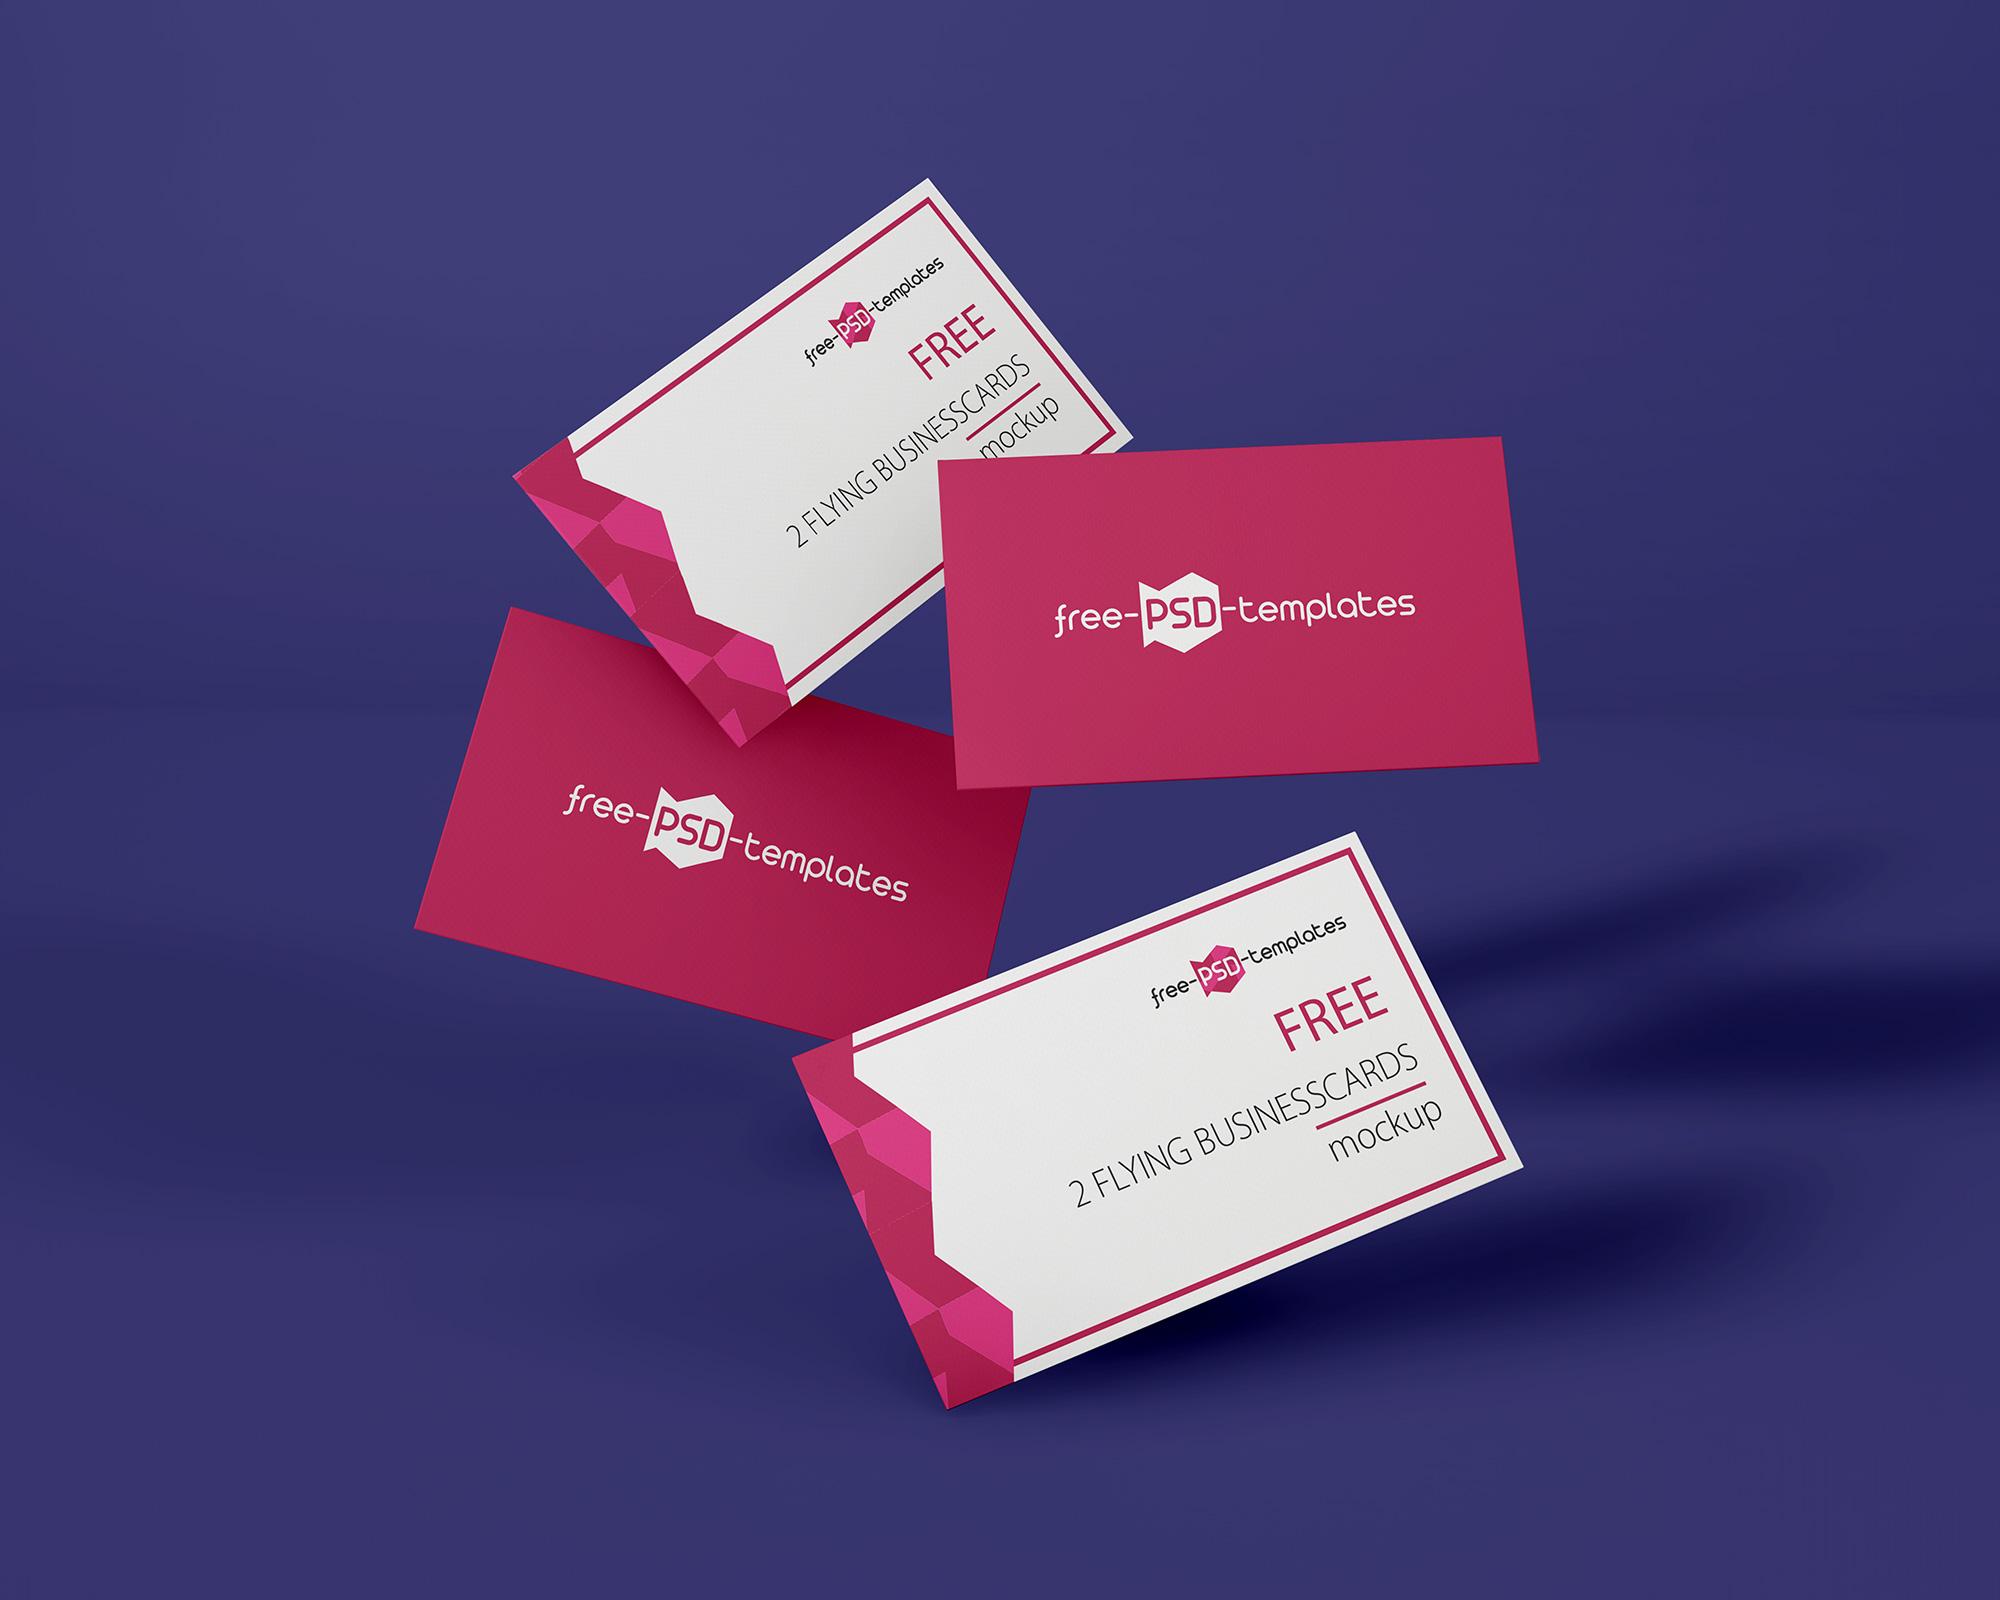 Flying Business Card Mockup 2